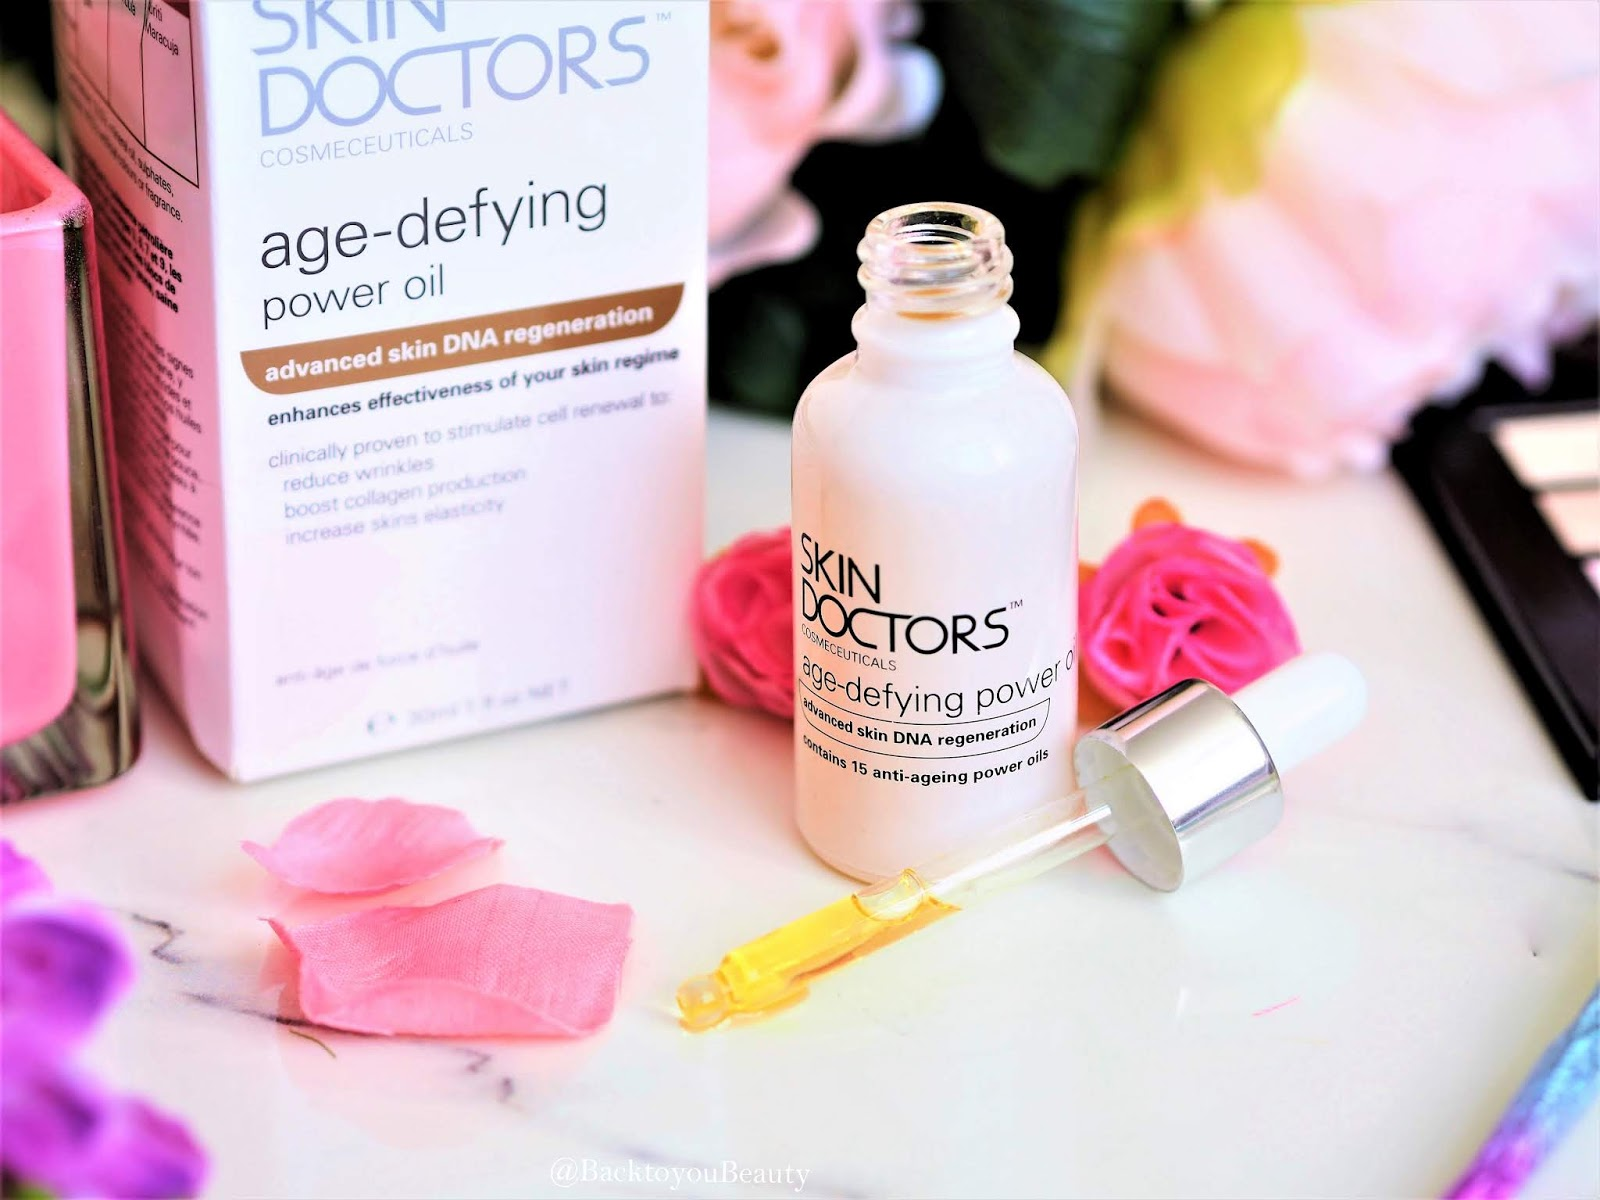 Skin Doctors Age Defying Power Oil